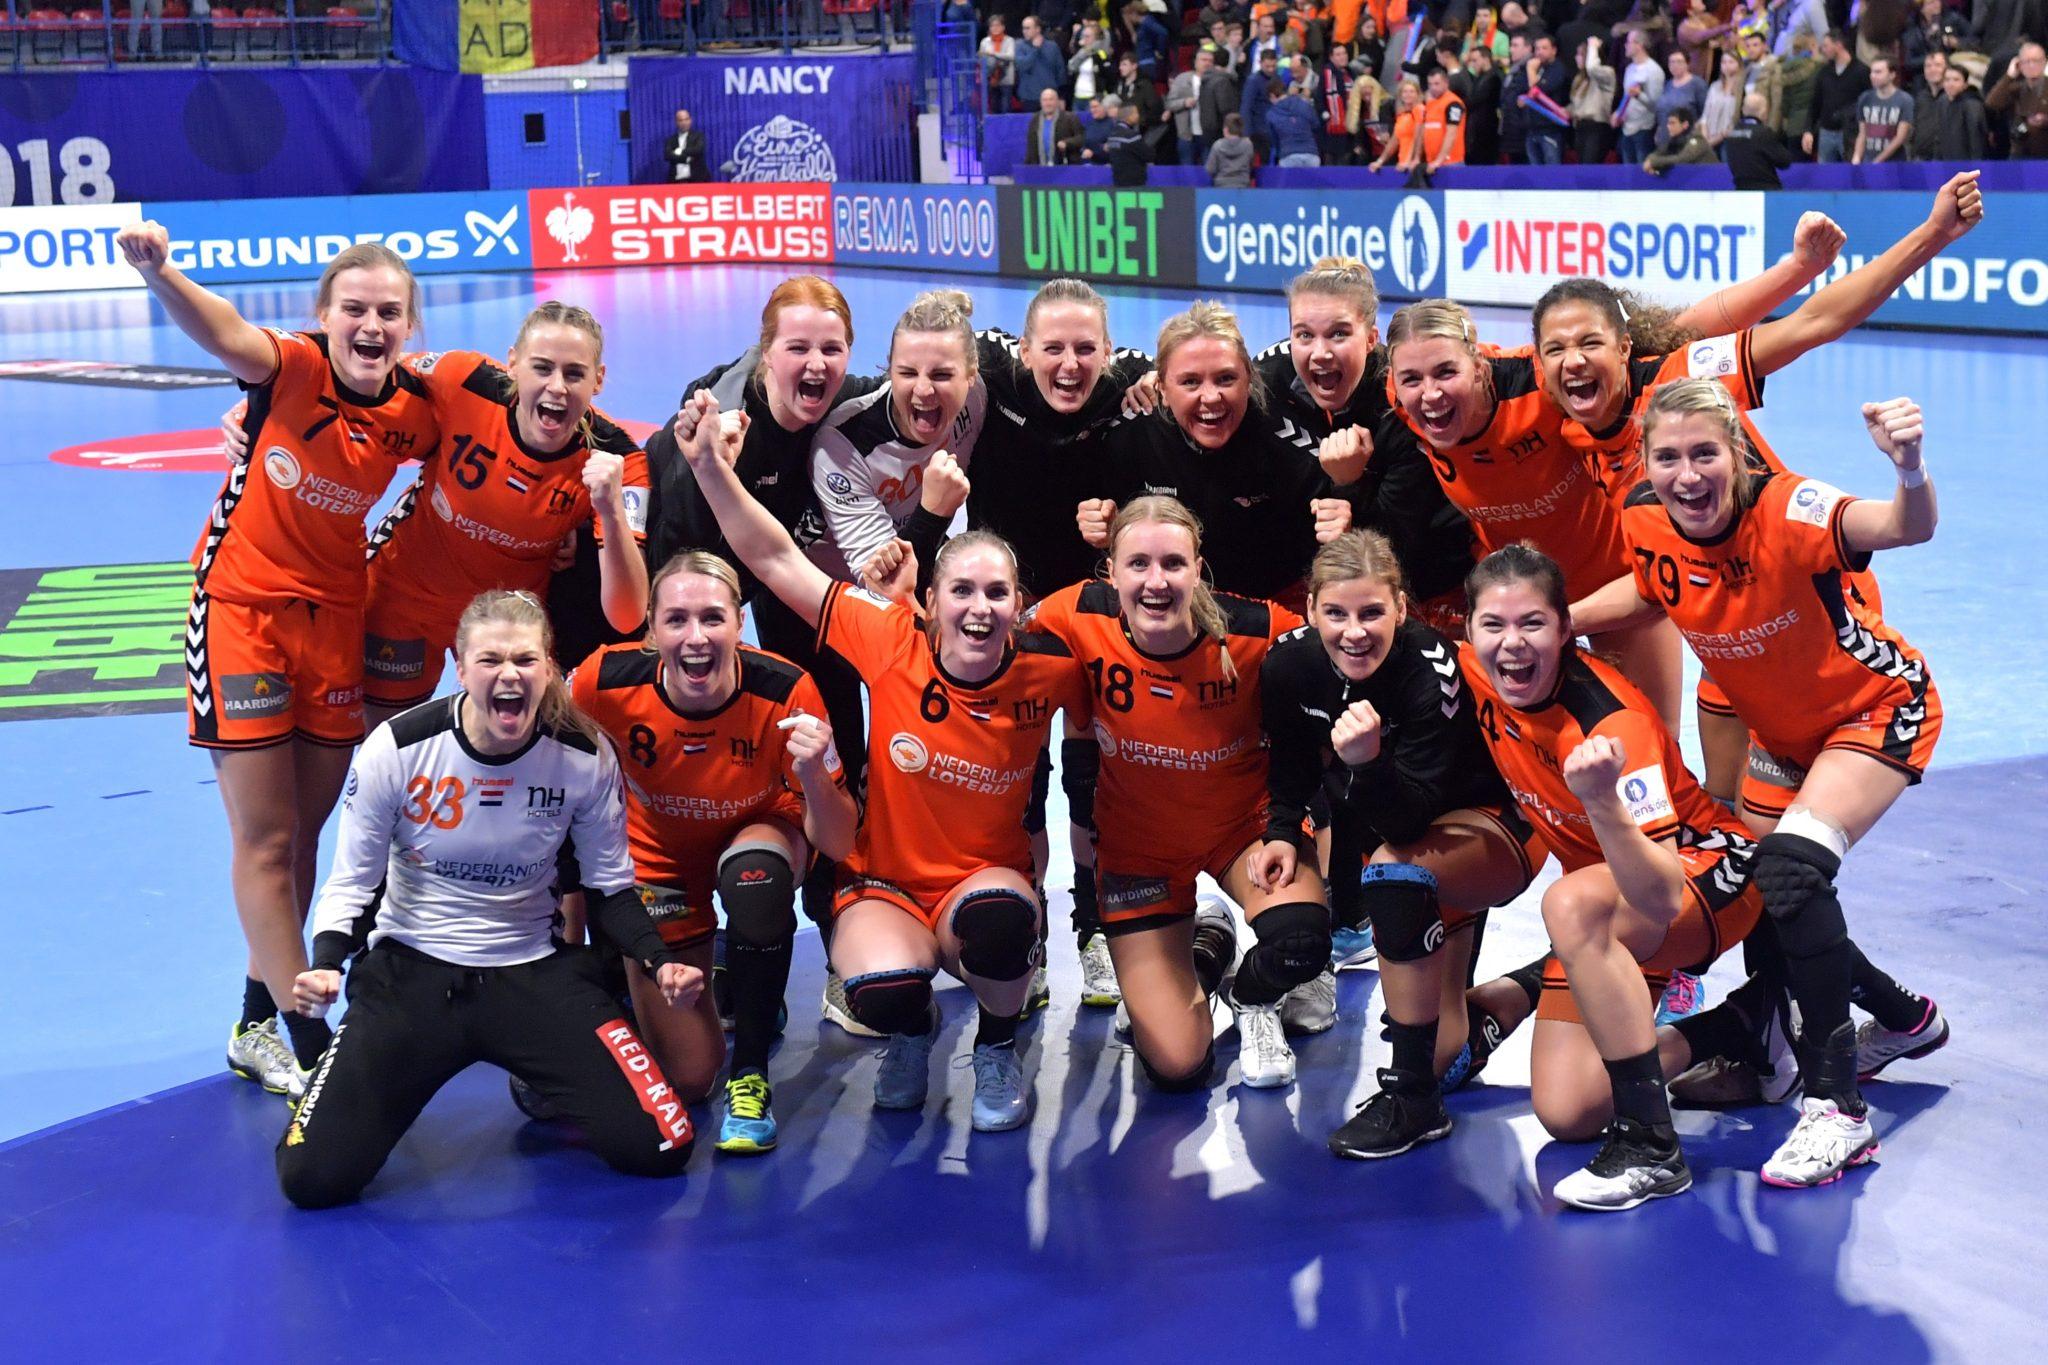 09-12-2018: Handbal: Vrouwen Nederland V Roemenie: Nancy EK Handbal In Frankrijk, Hoofdronde Groep II Nederland - Roemenie 29-24 De Overwinningsfoto